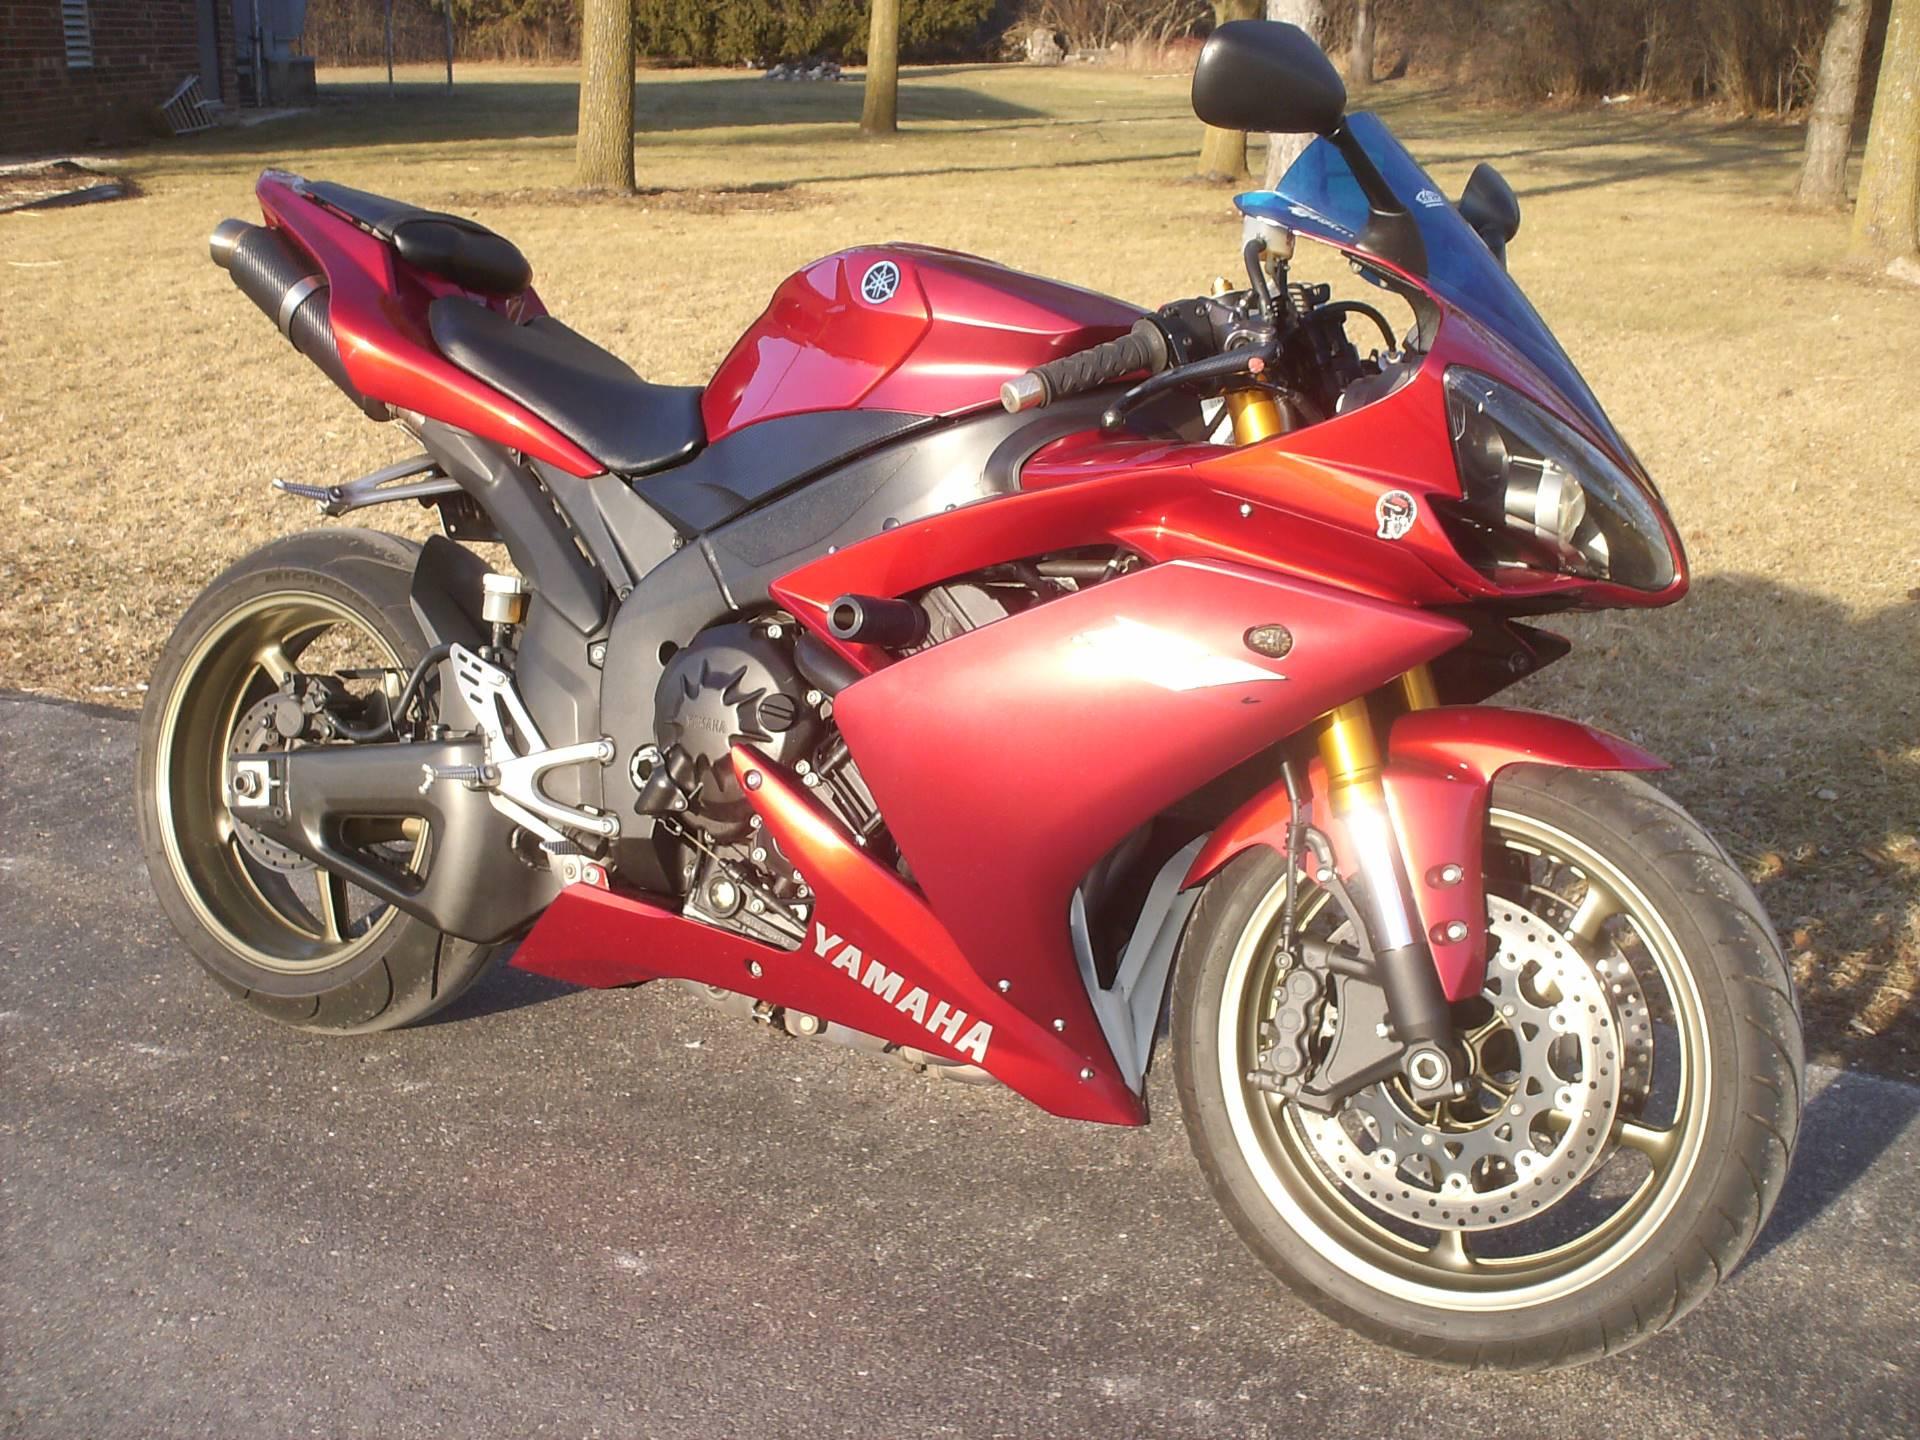 2008 Yamaha YZF-R1 5